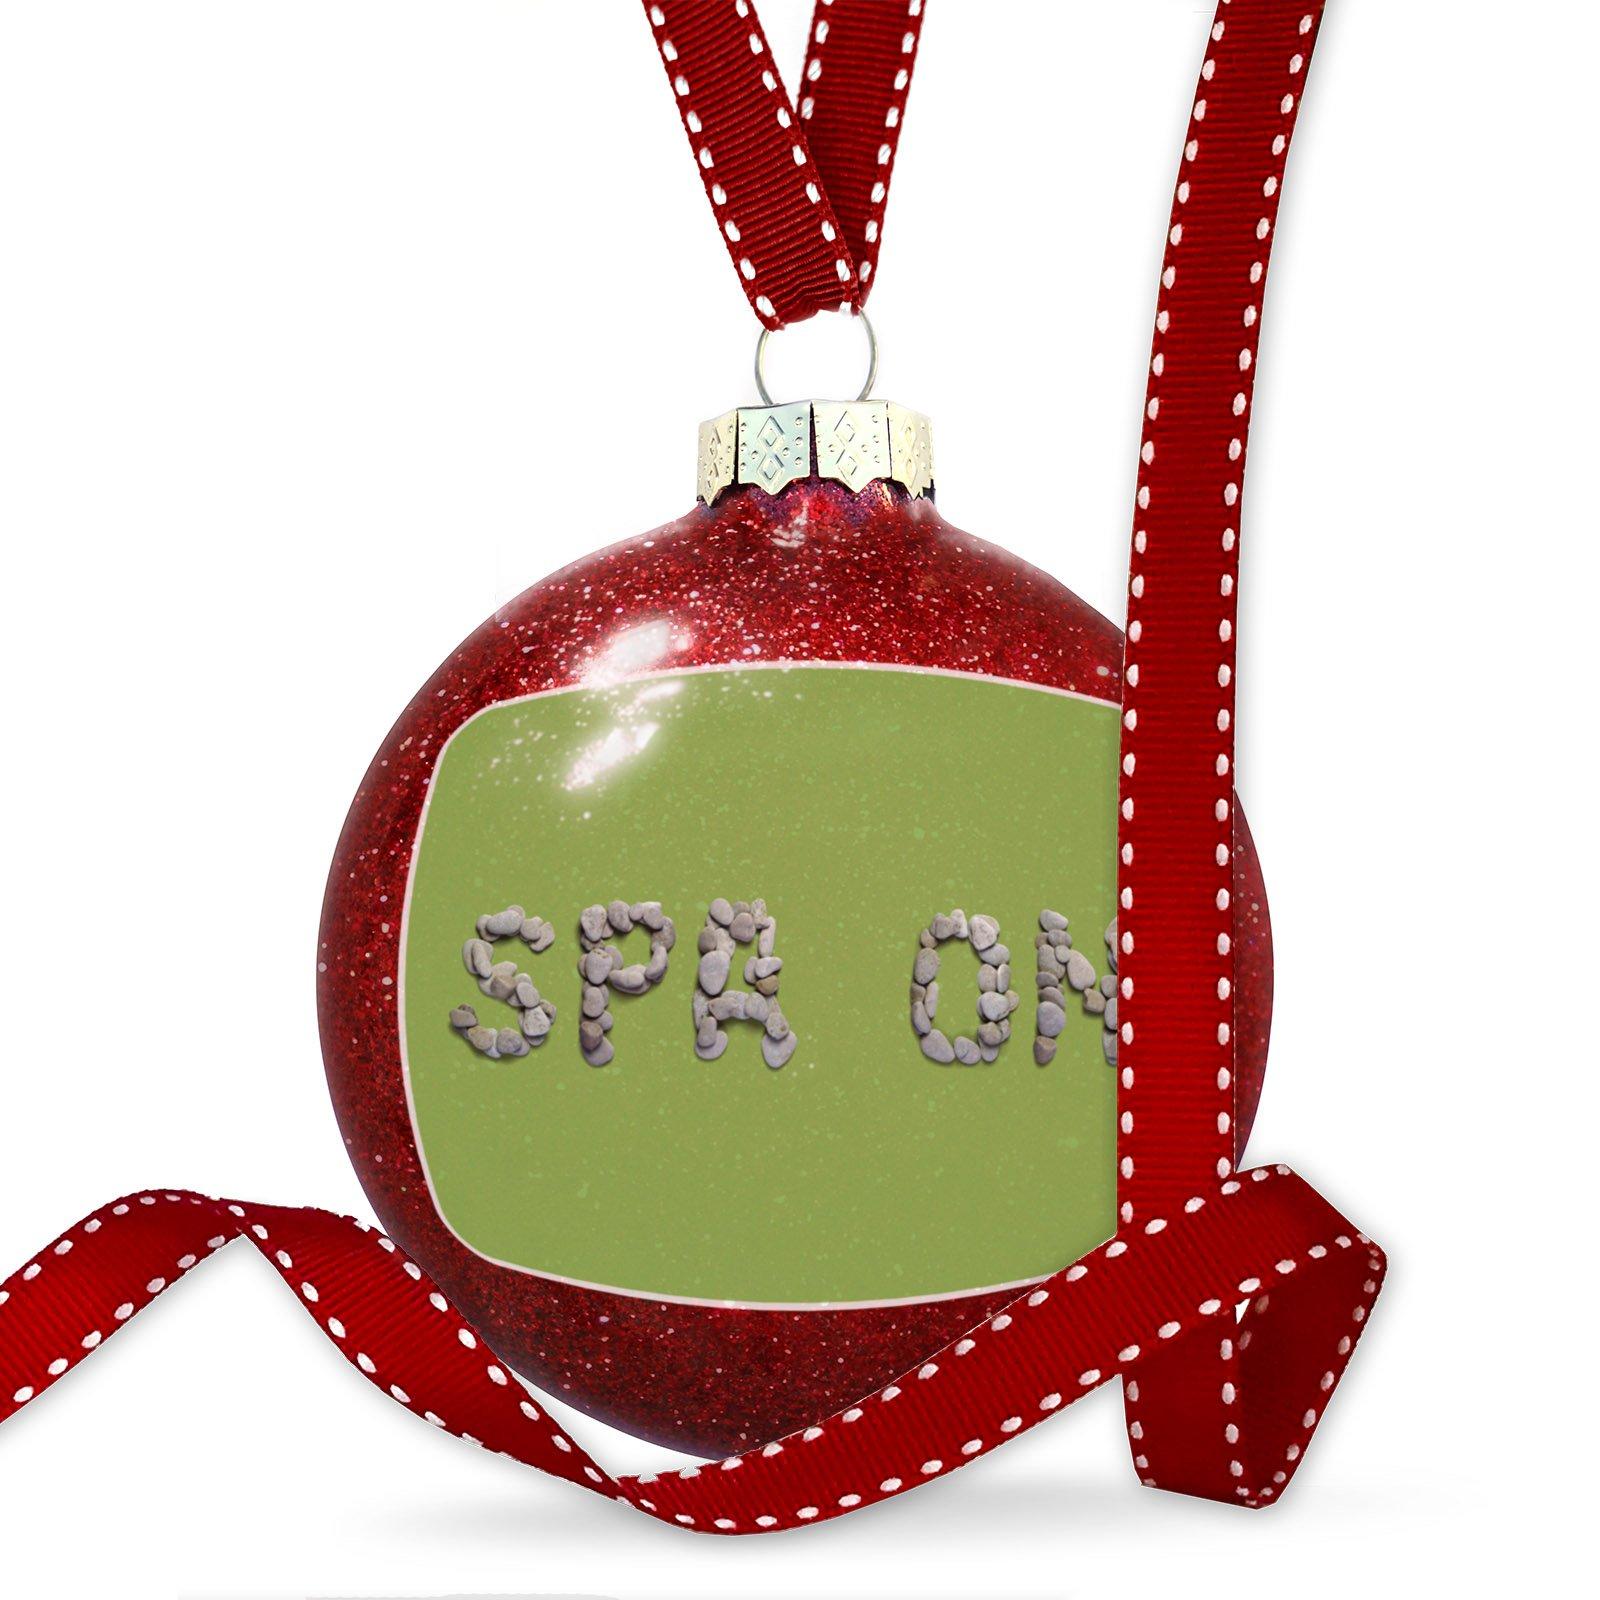 Christmas Decoration Spa On Spa Stones Rocks Ornament